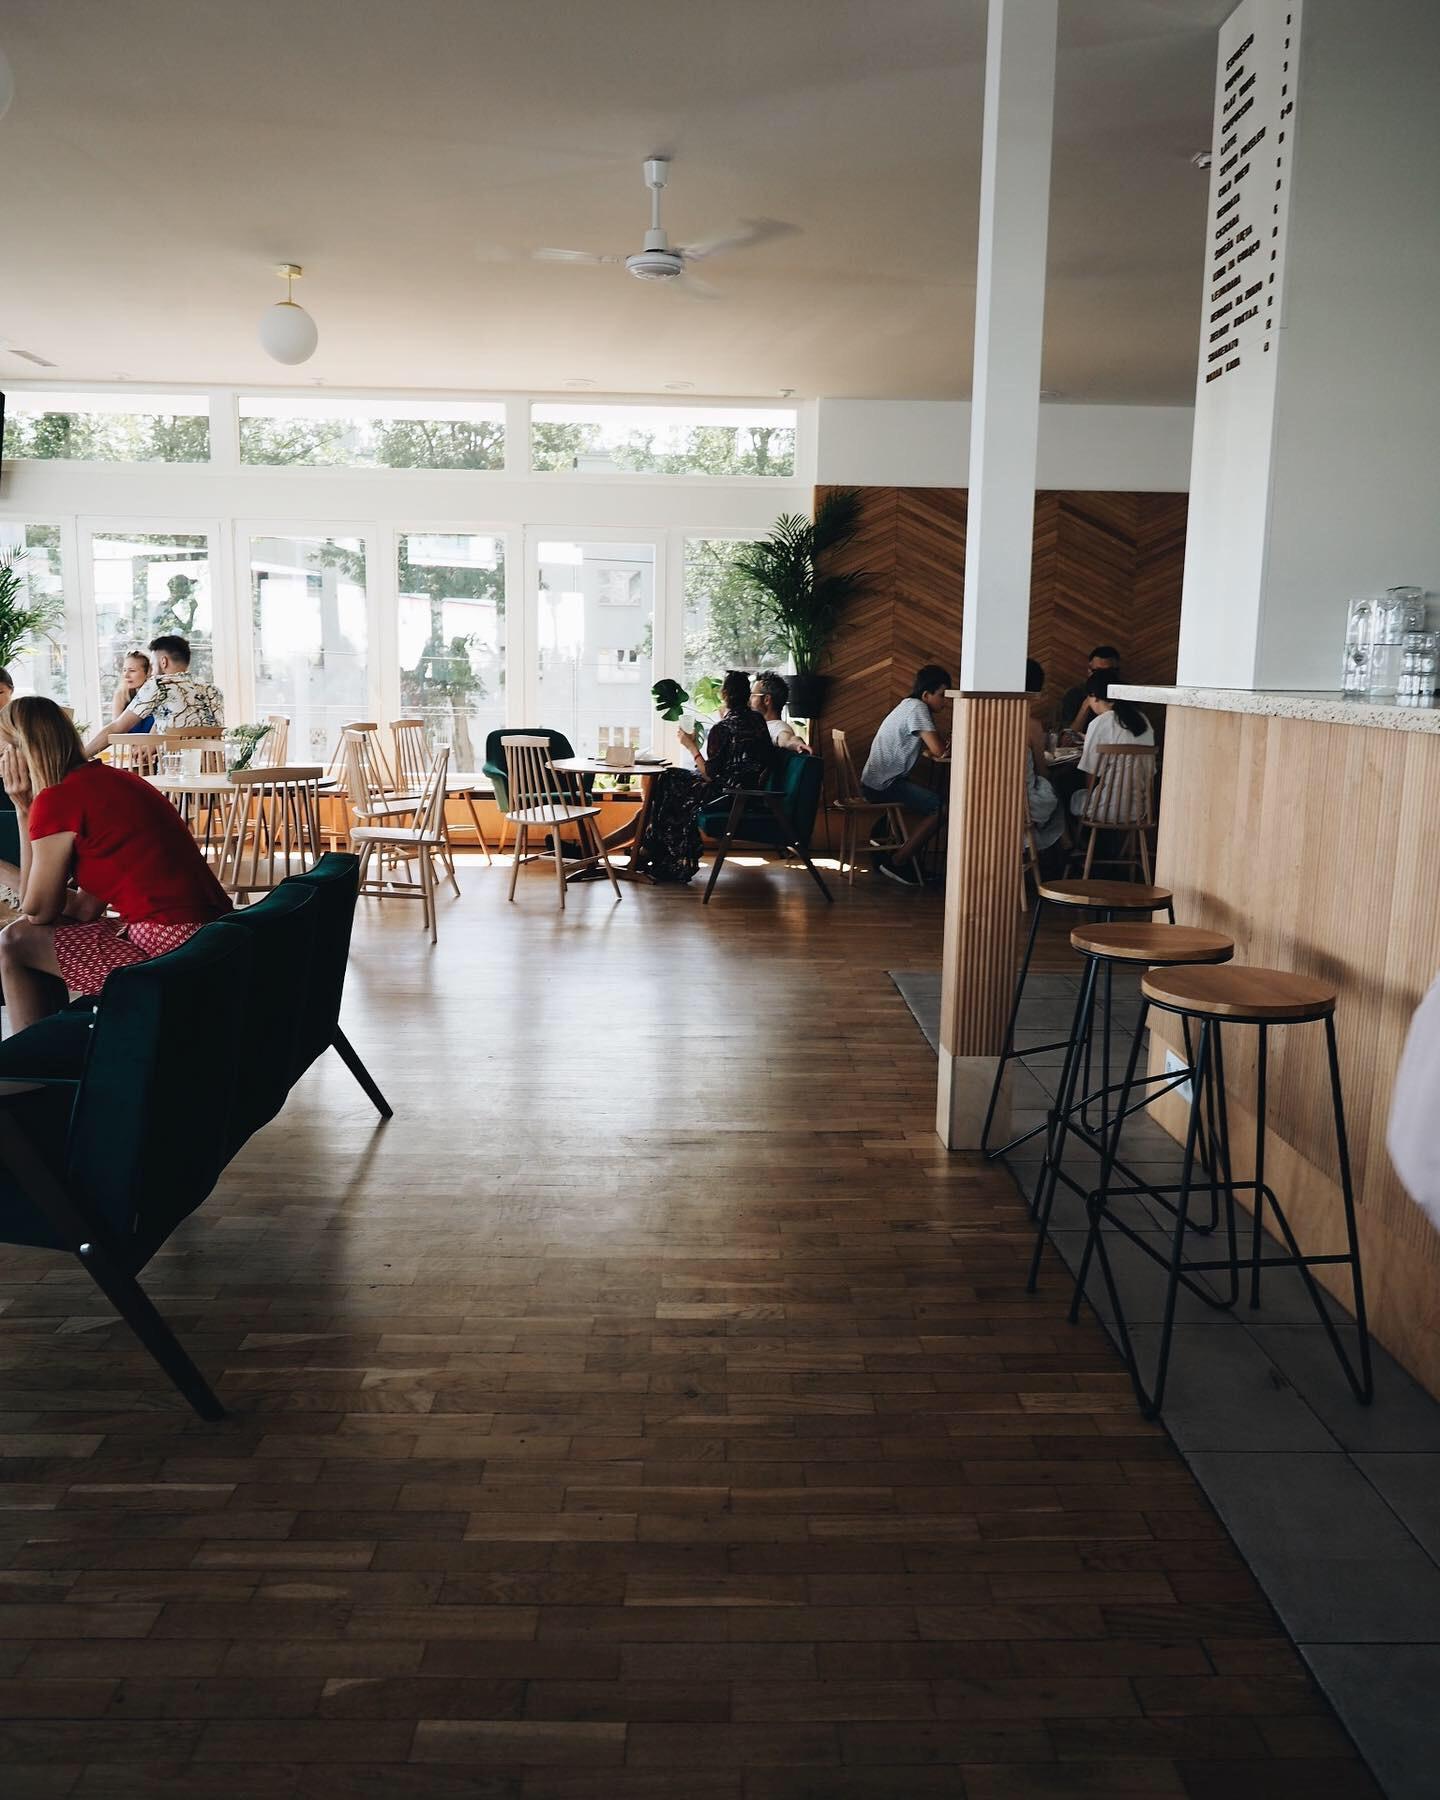 Cafe Bar Havana – Warszawa, Żoliborz